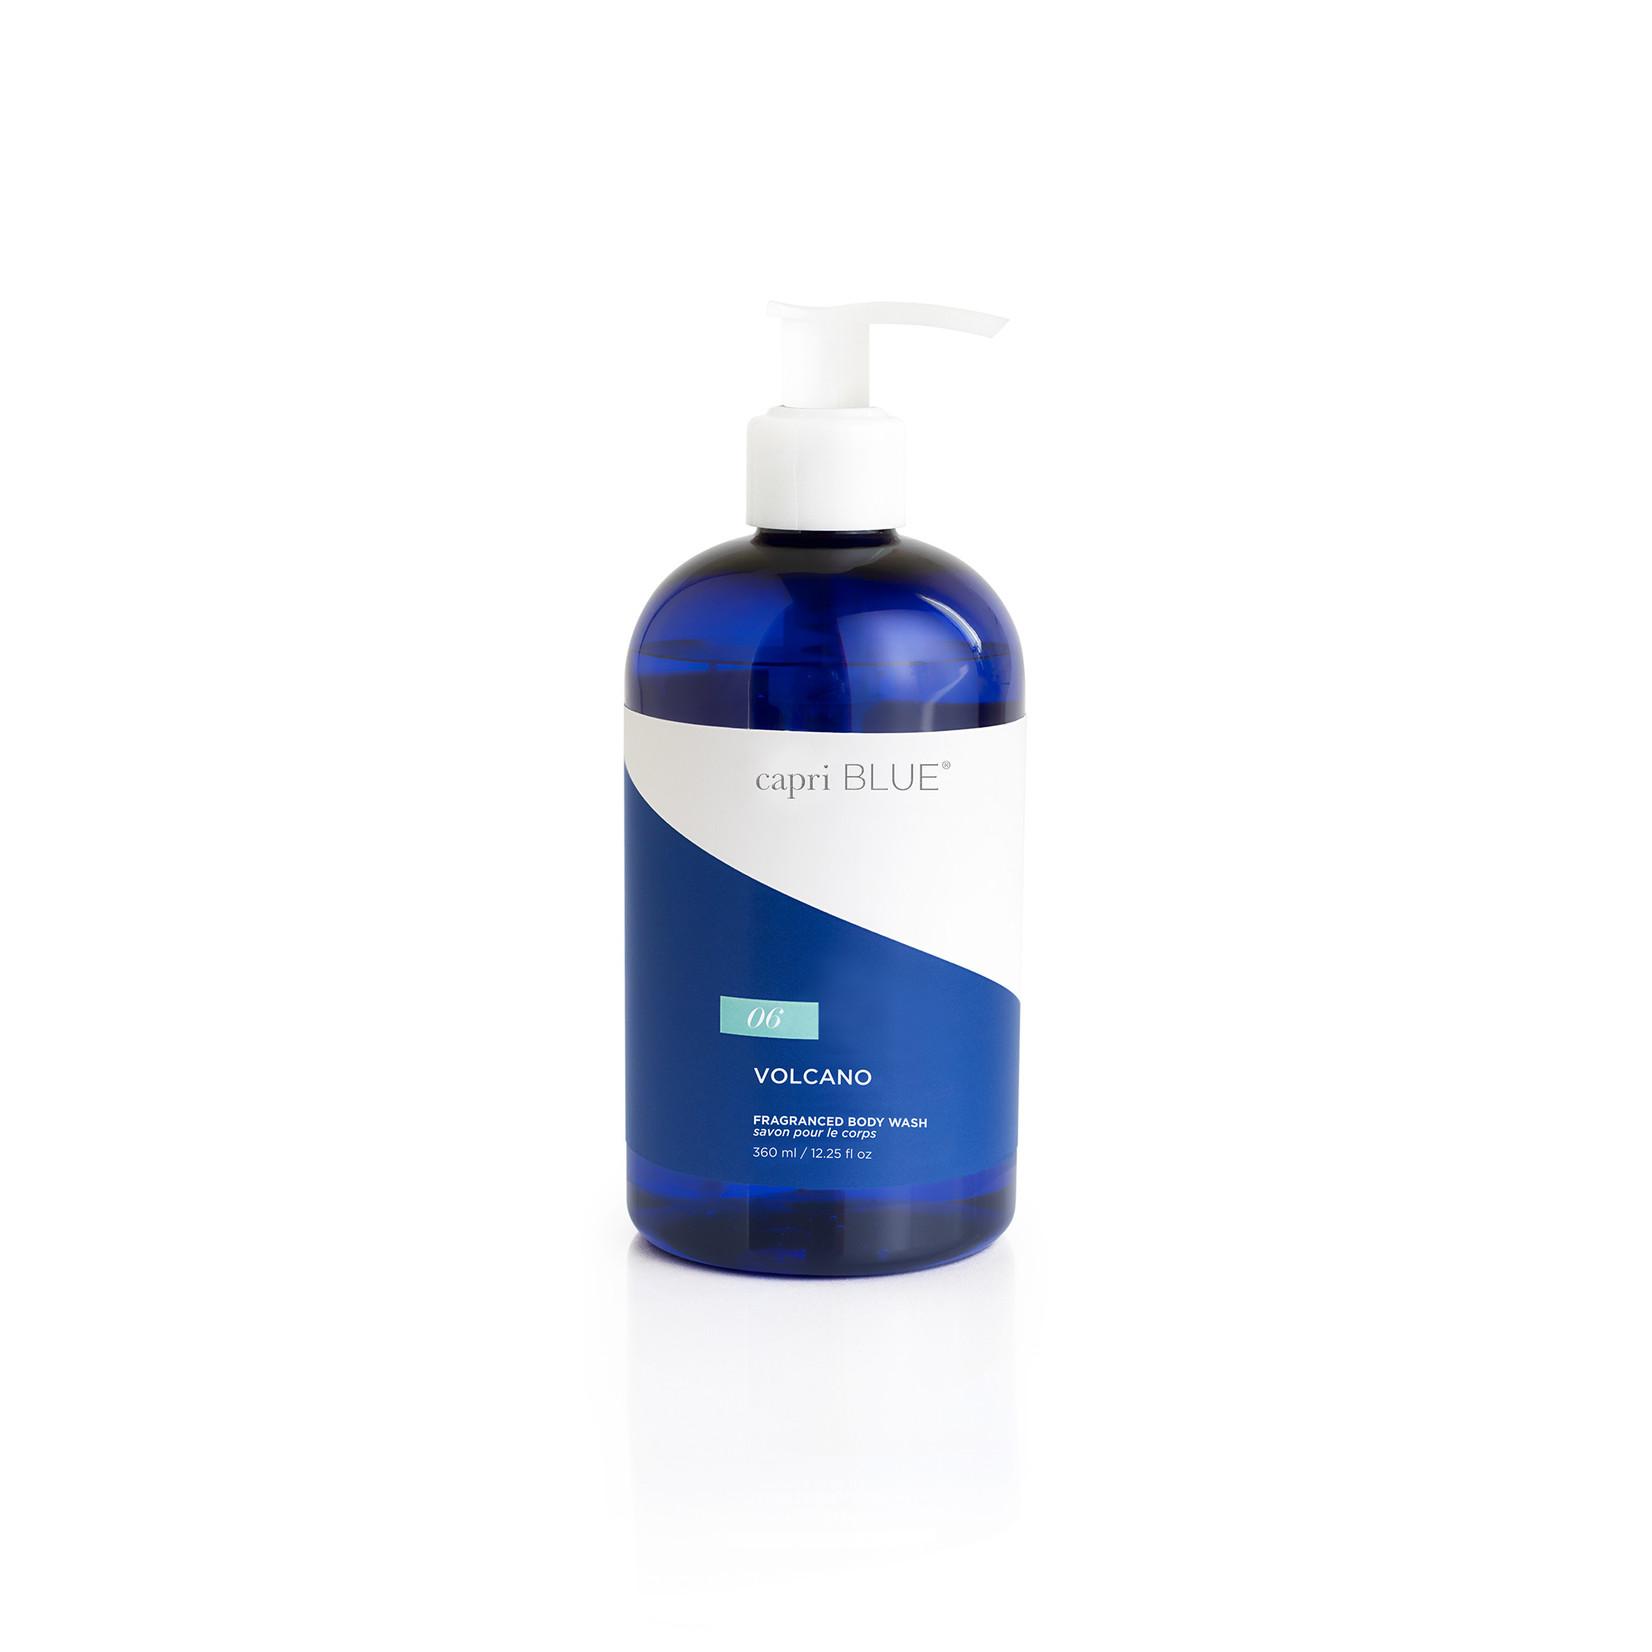 capri BLUE® Volcano Body Wash